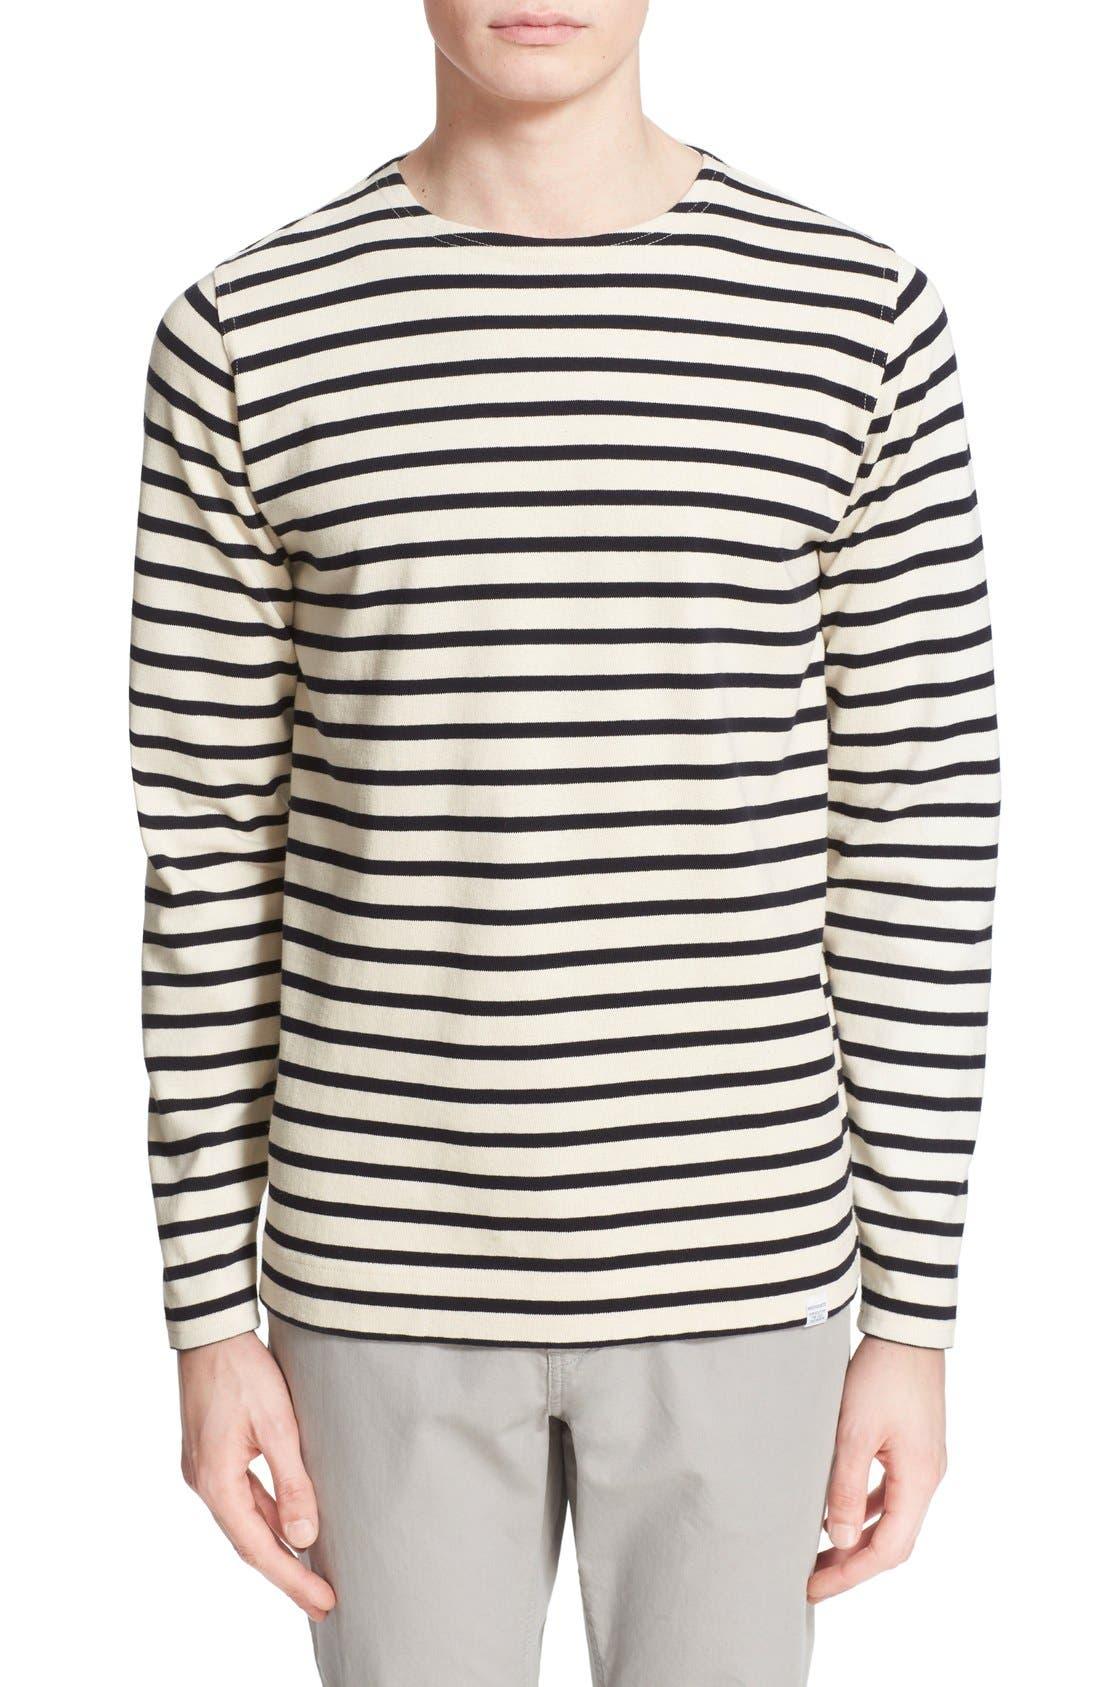 'Godtfred' Stripe Long Sleeve T-Shirt,                             Main thumbnail 1, color,                             410